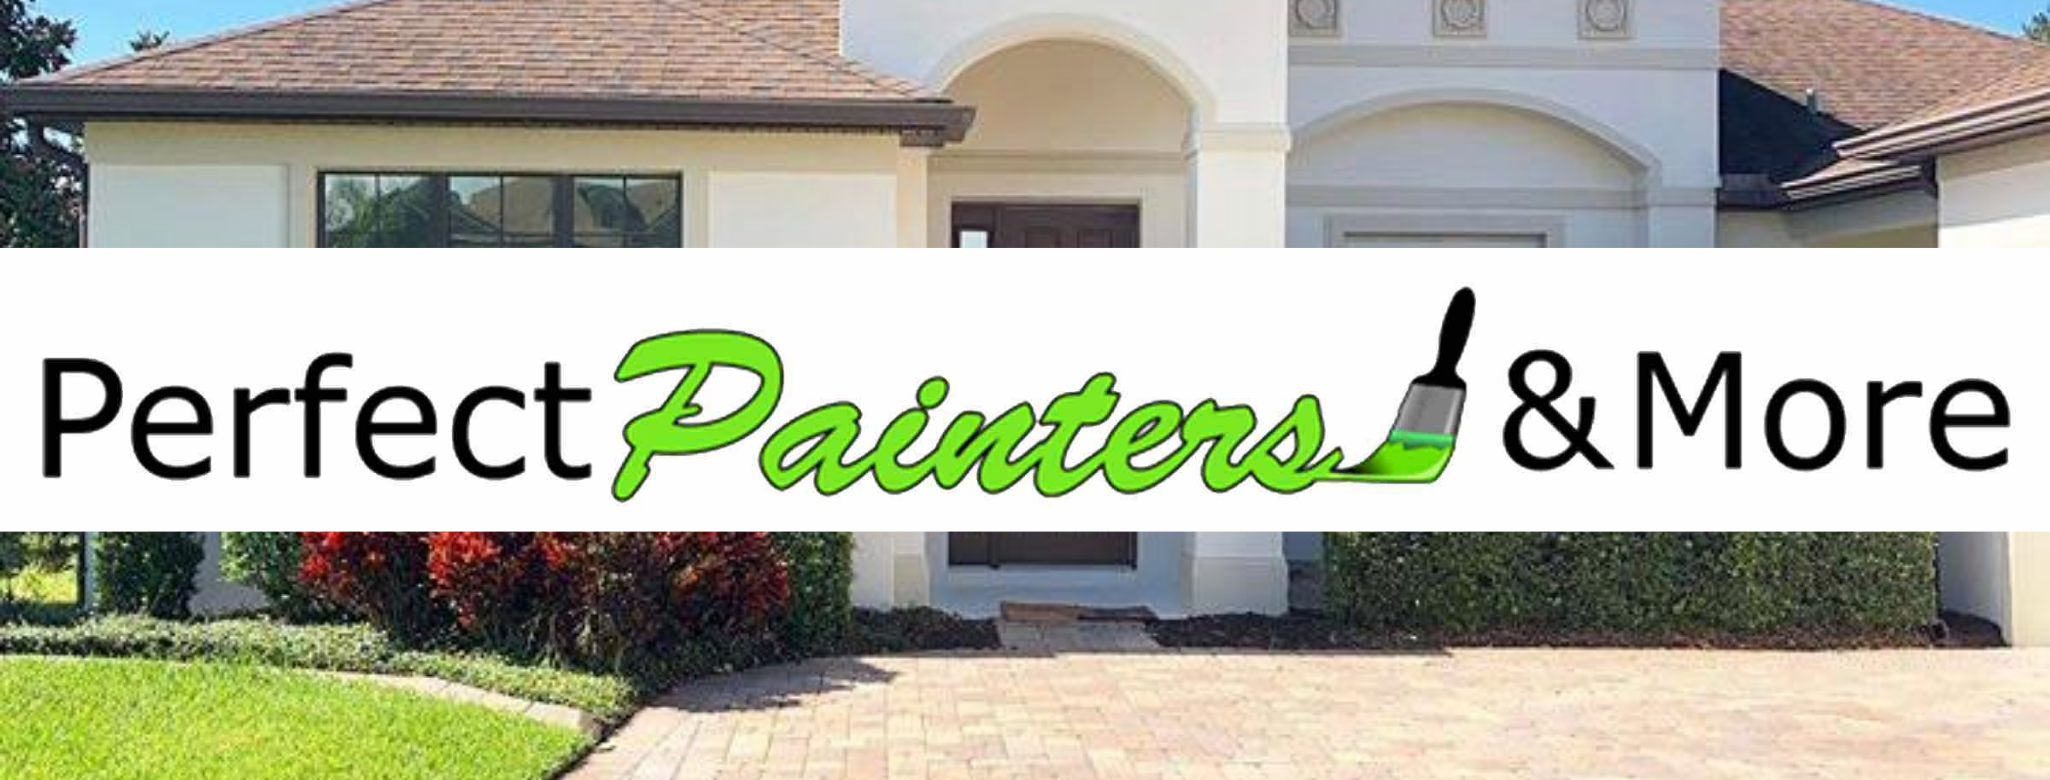 Perfect Painters Orlando reviews | Painters at 3936 S. Semoran Blvd - Orlando FL